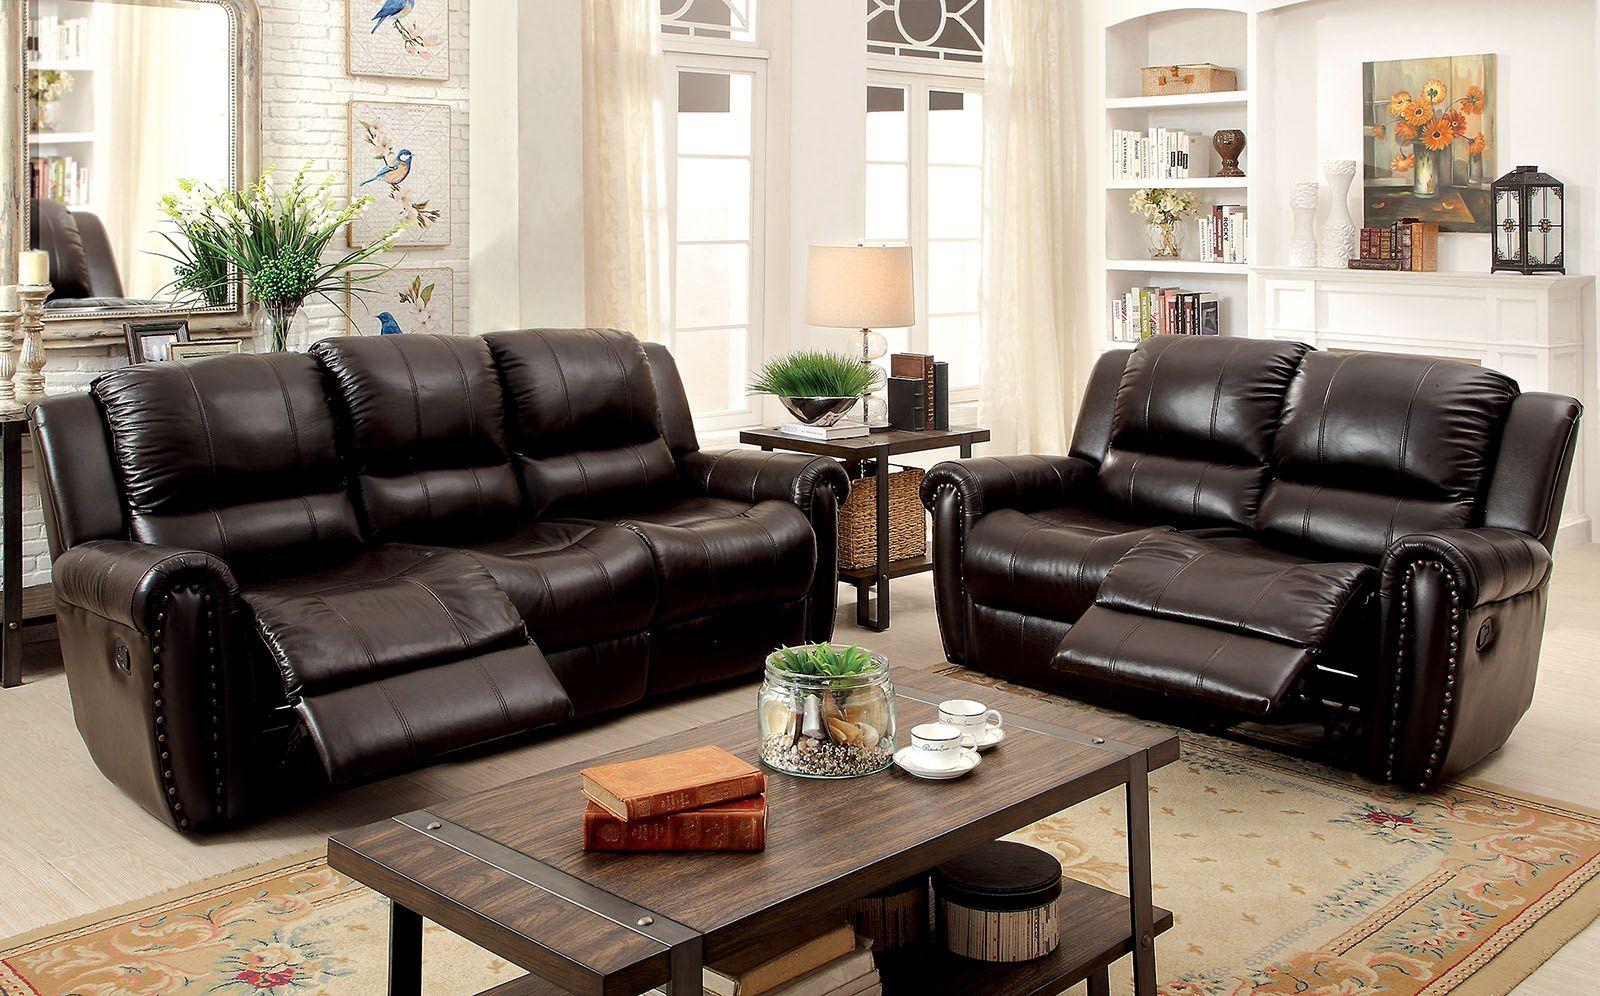 Foxboro Leather Reclining Living Room Set Cm6909sf